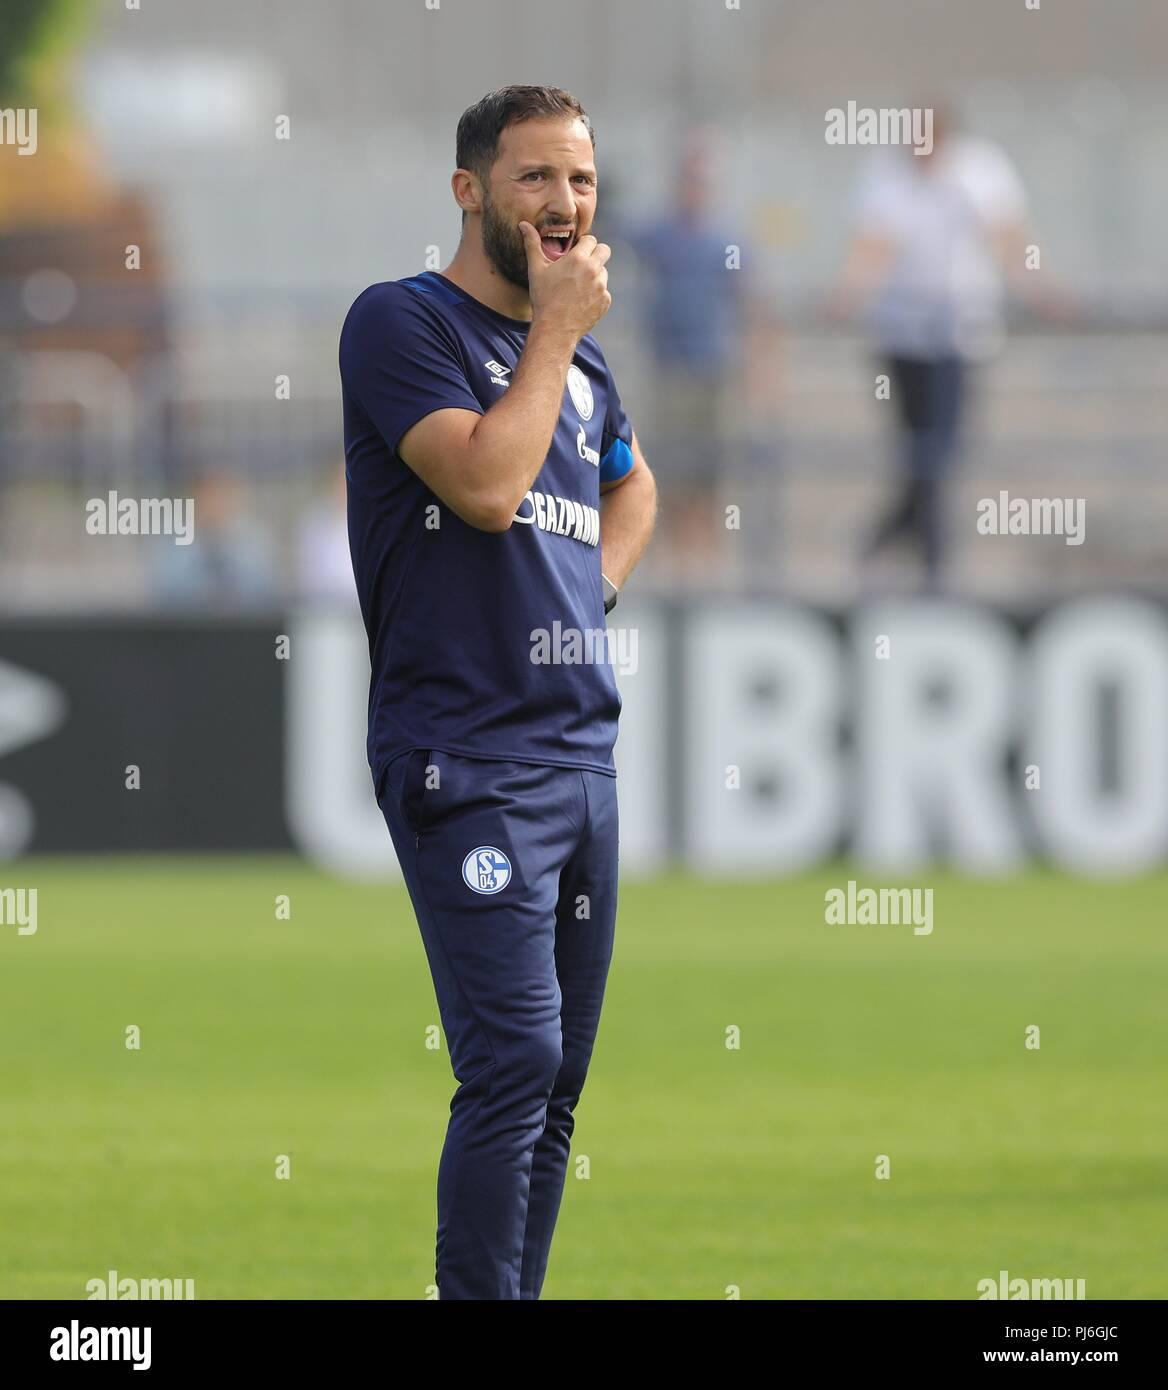 firo: 05.09.2018, football, 1.Bundesliga, season 2018/2019, FC Schalke 04, training, coach Domenico TEDESCO, thoughtful   usage worldwide - Stock Image